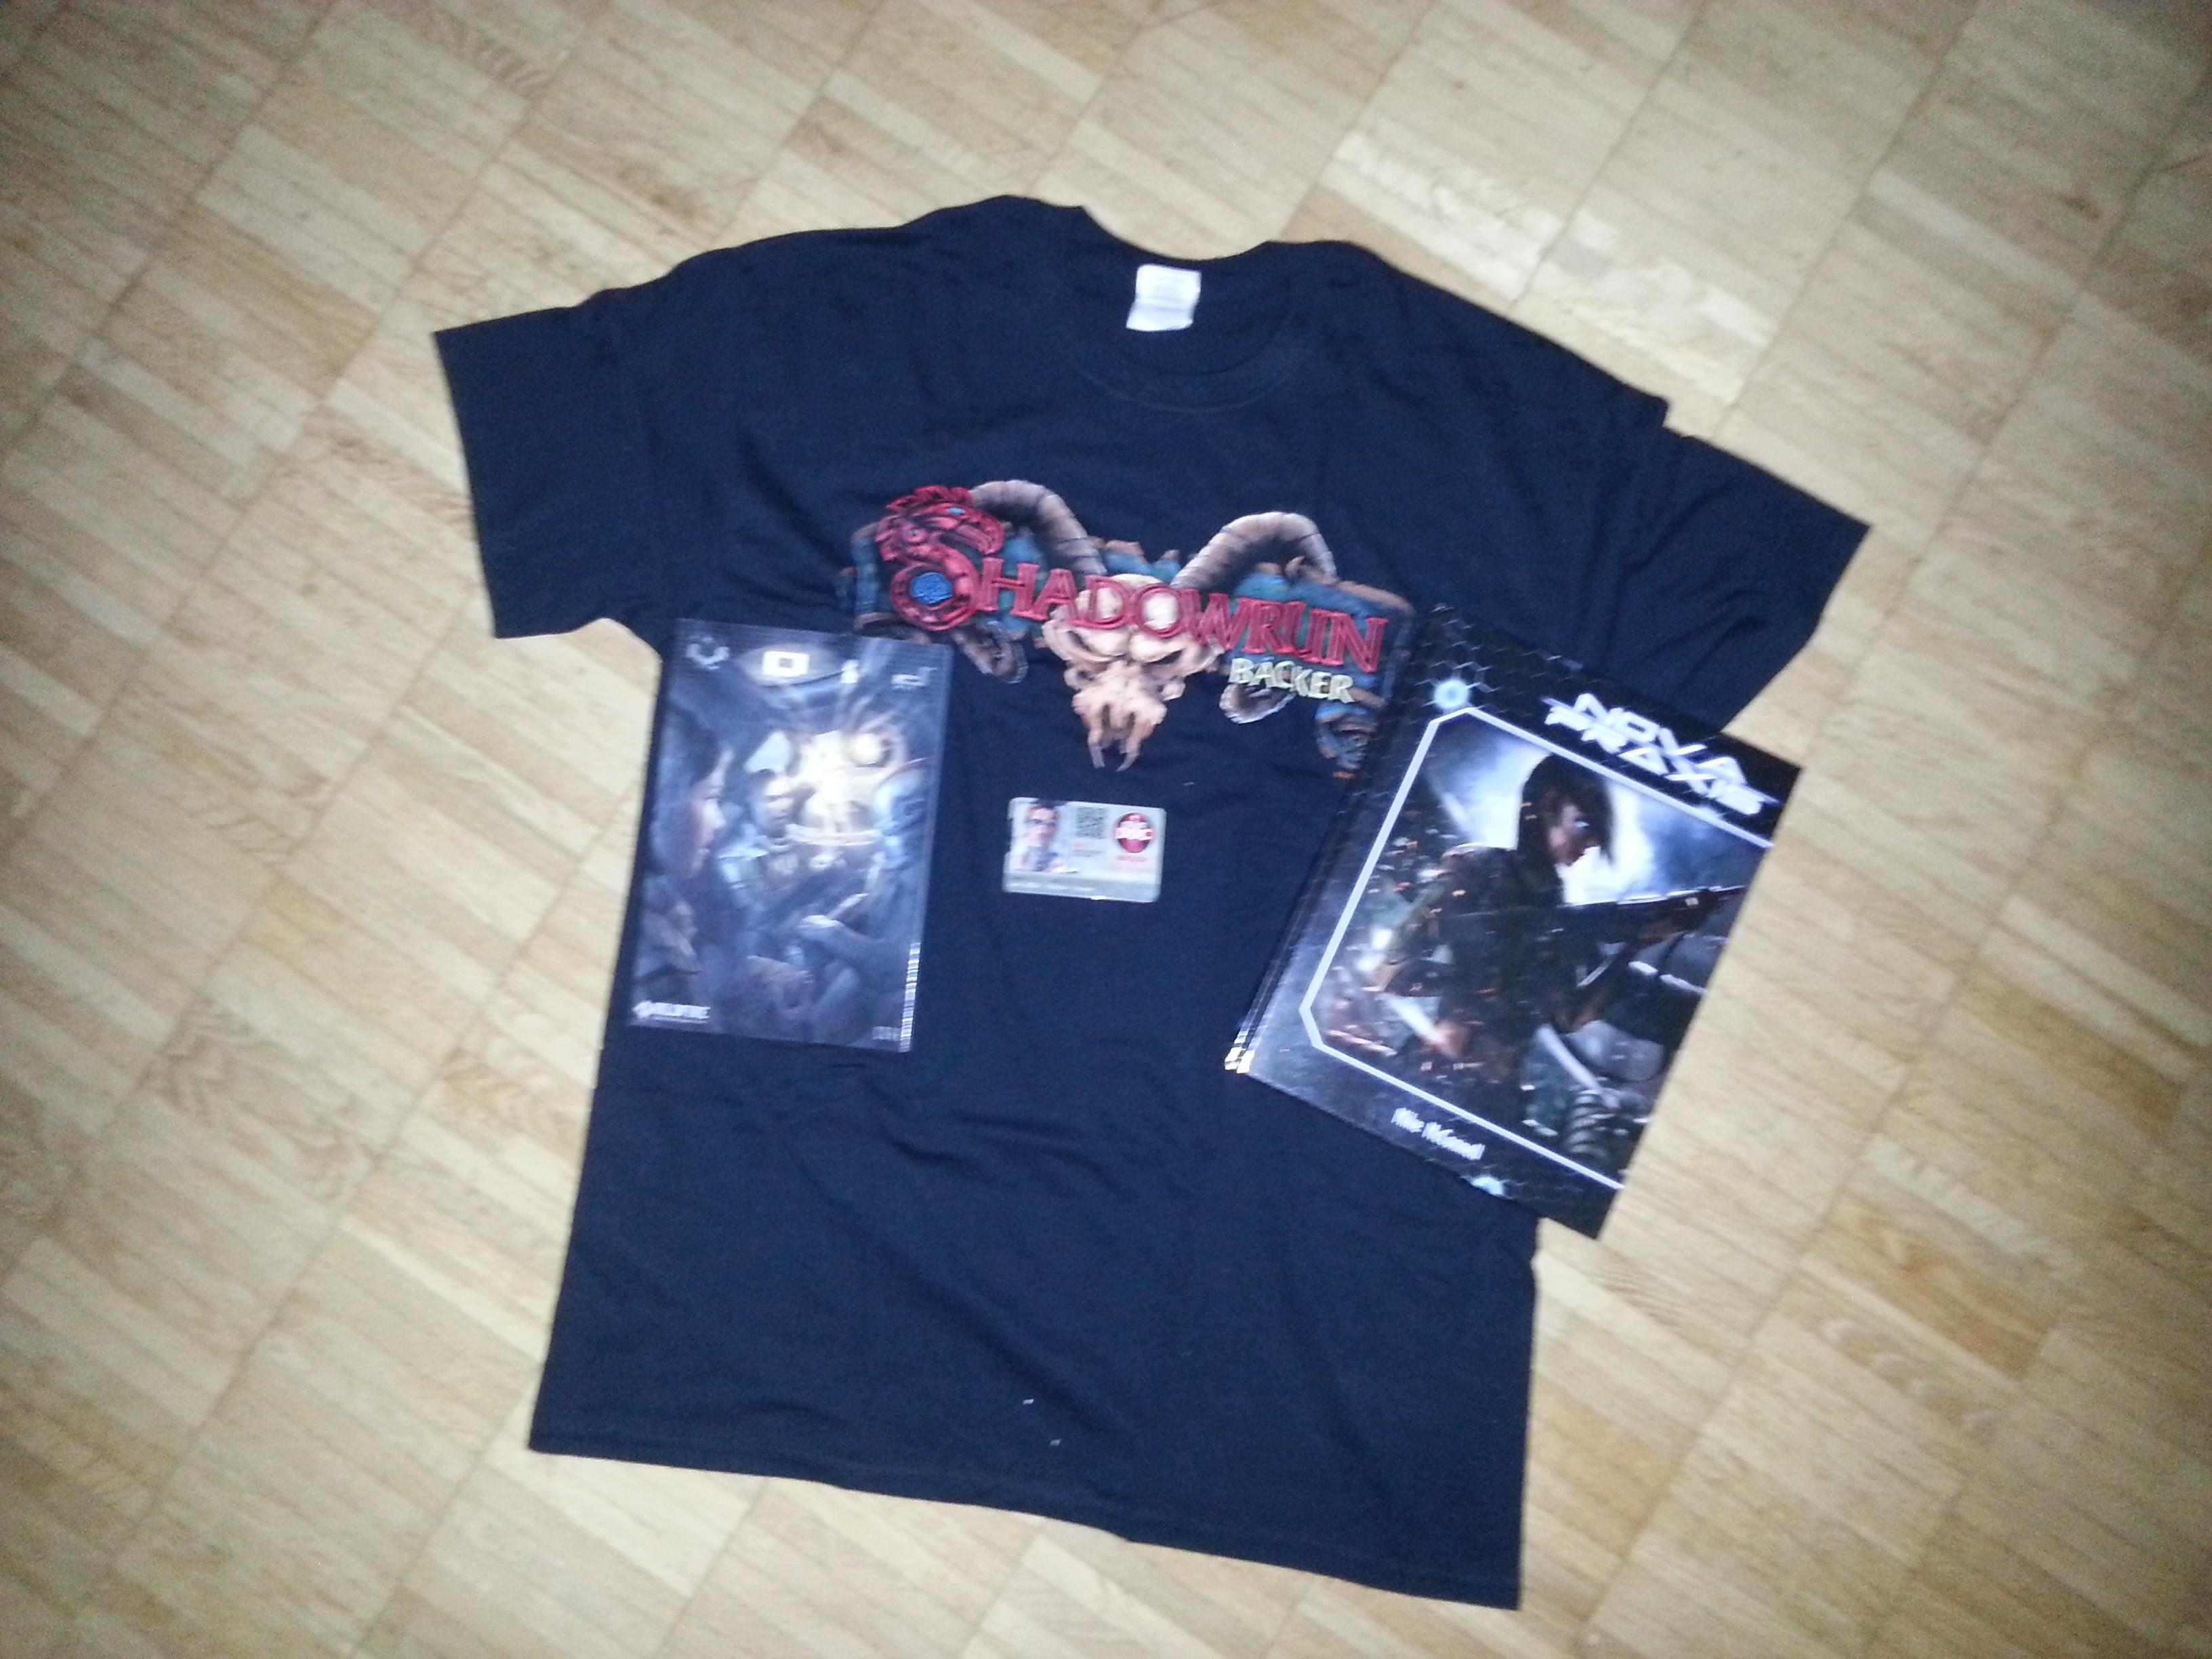 Shadowrun Backer (Shirt, Doc Wagon Card) & Alternativen (Nova Praxis, The Void)